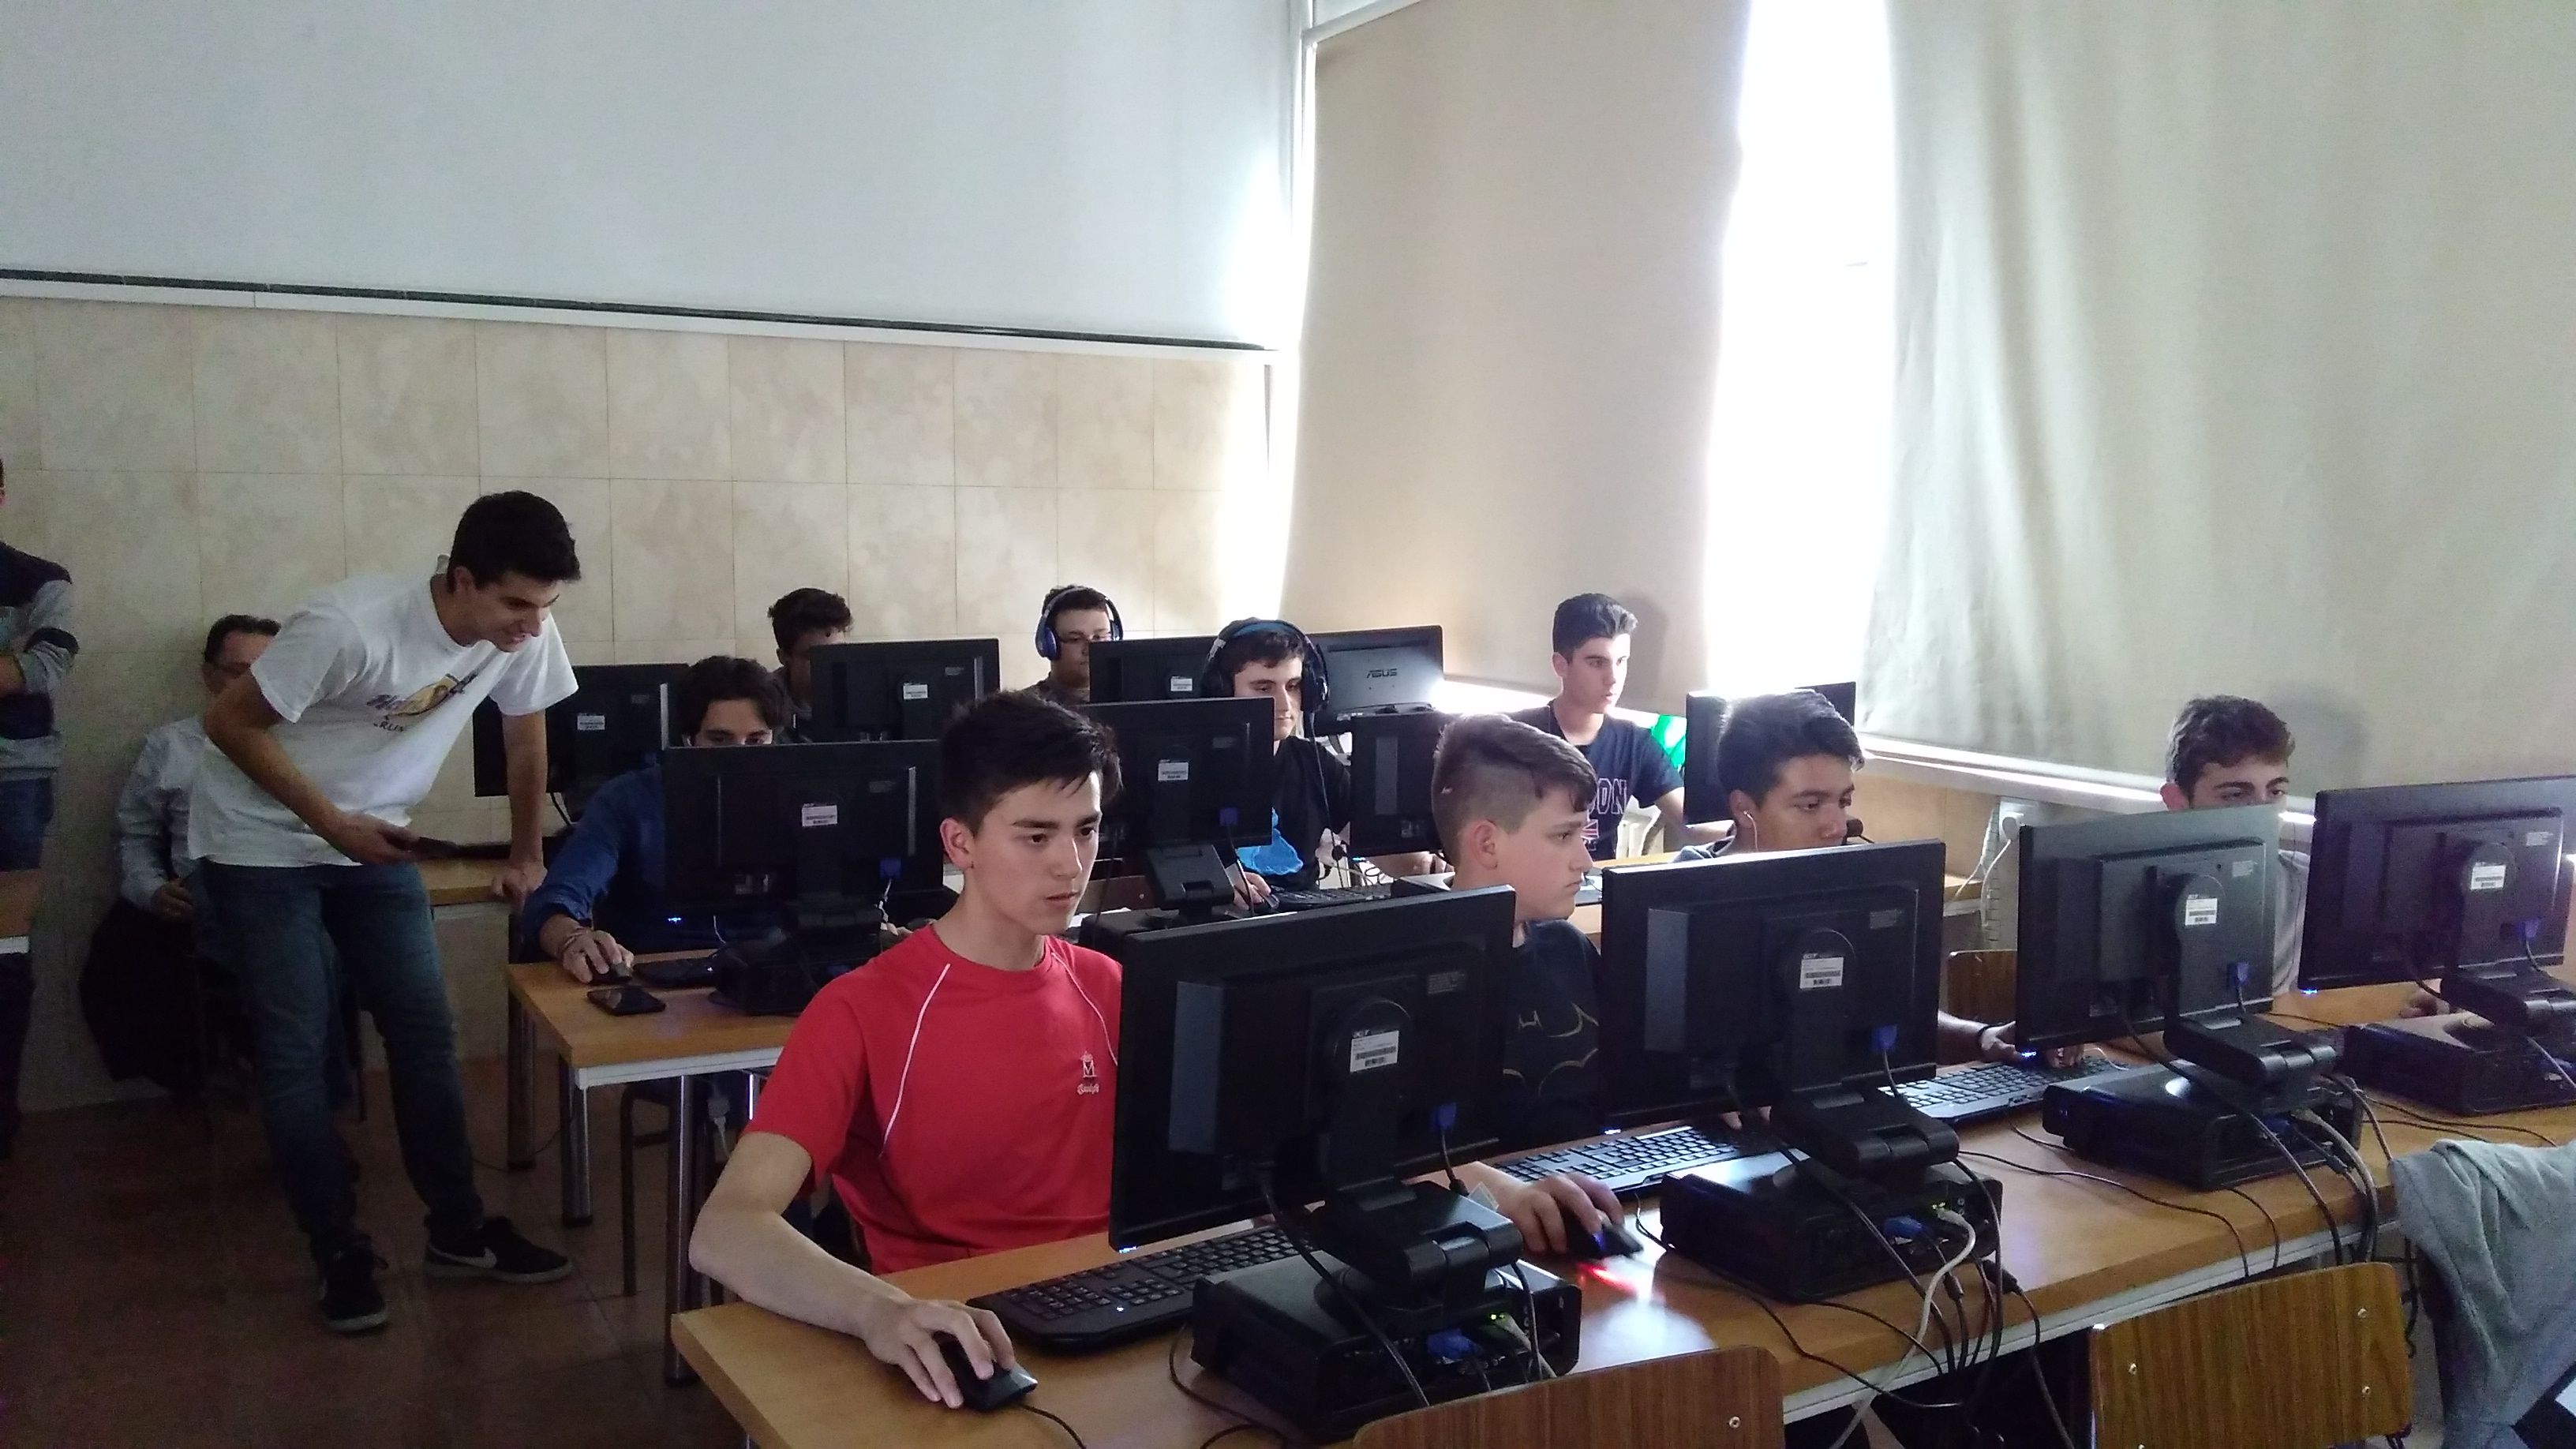 II Cibercampeonato Solidario